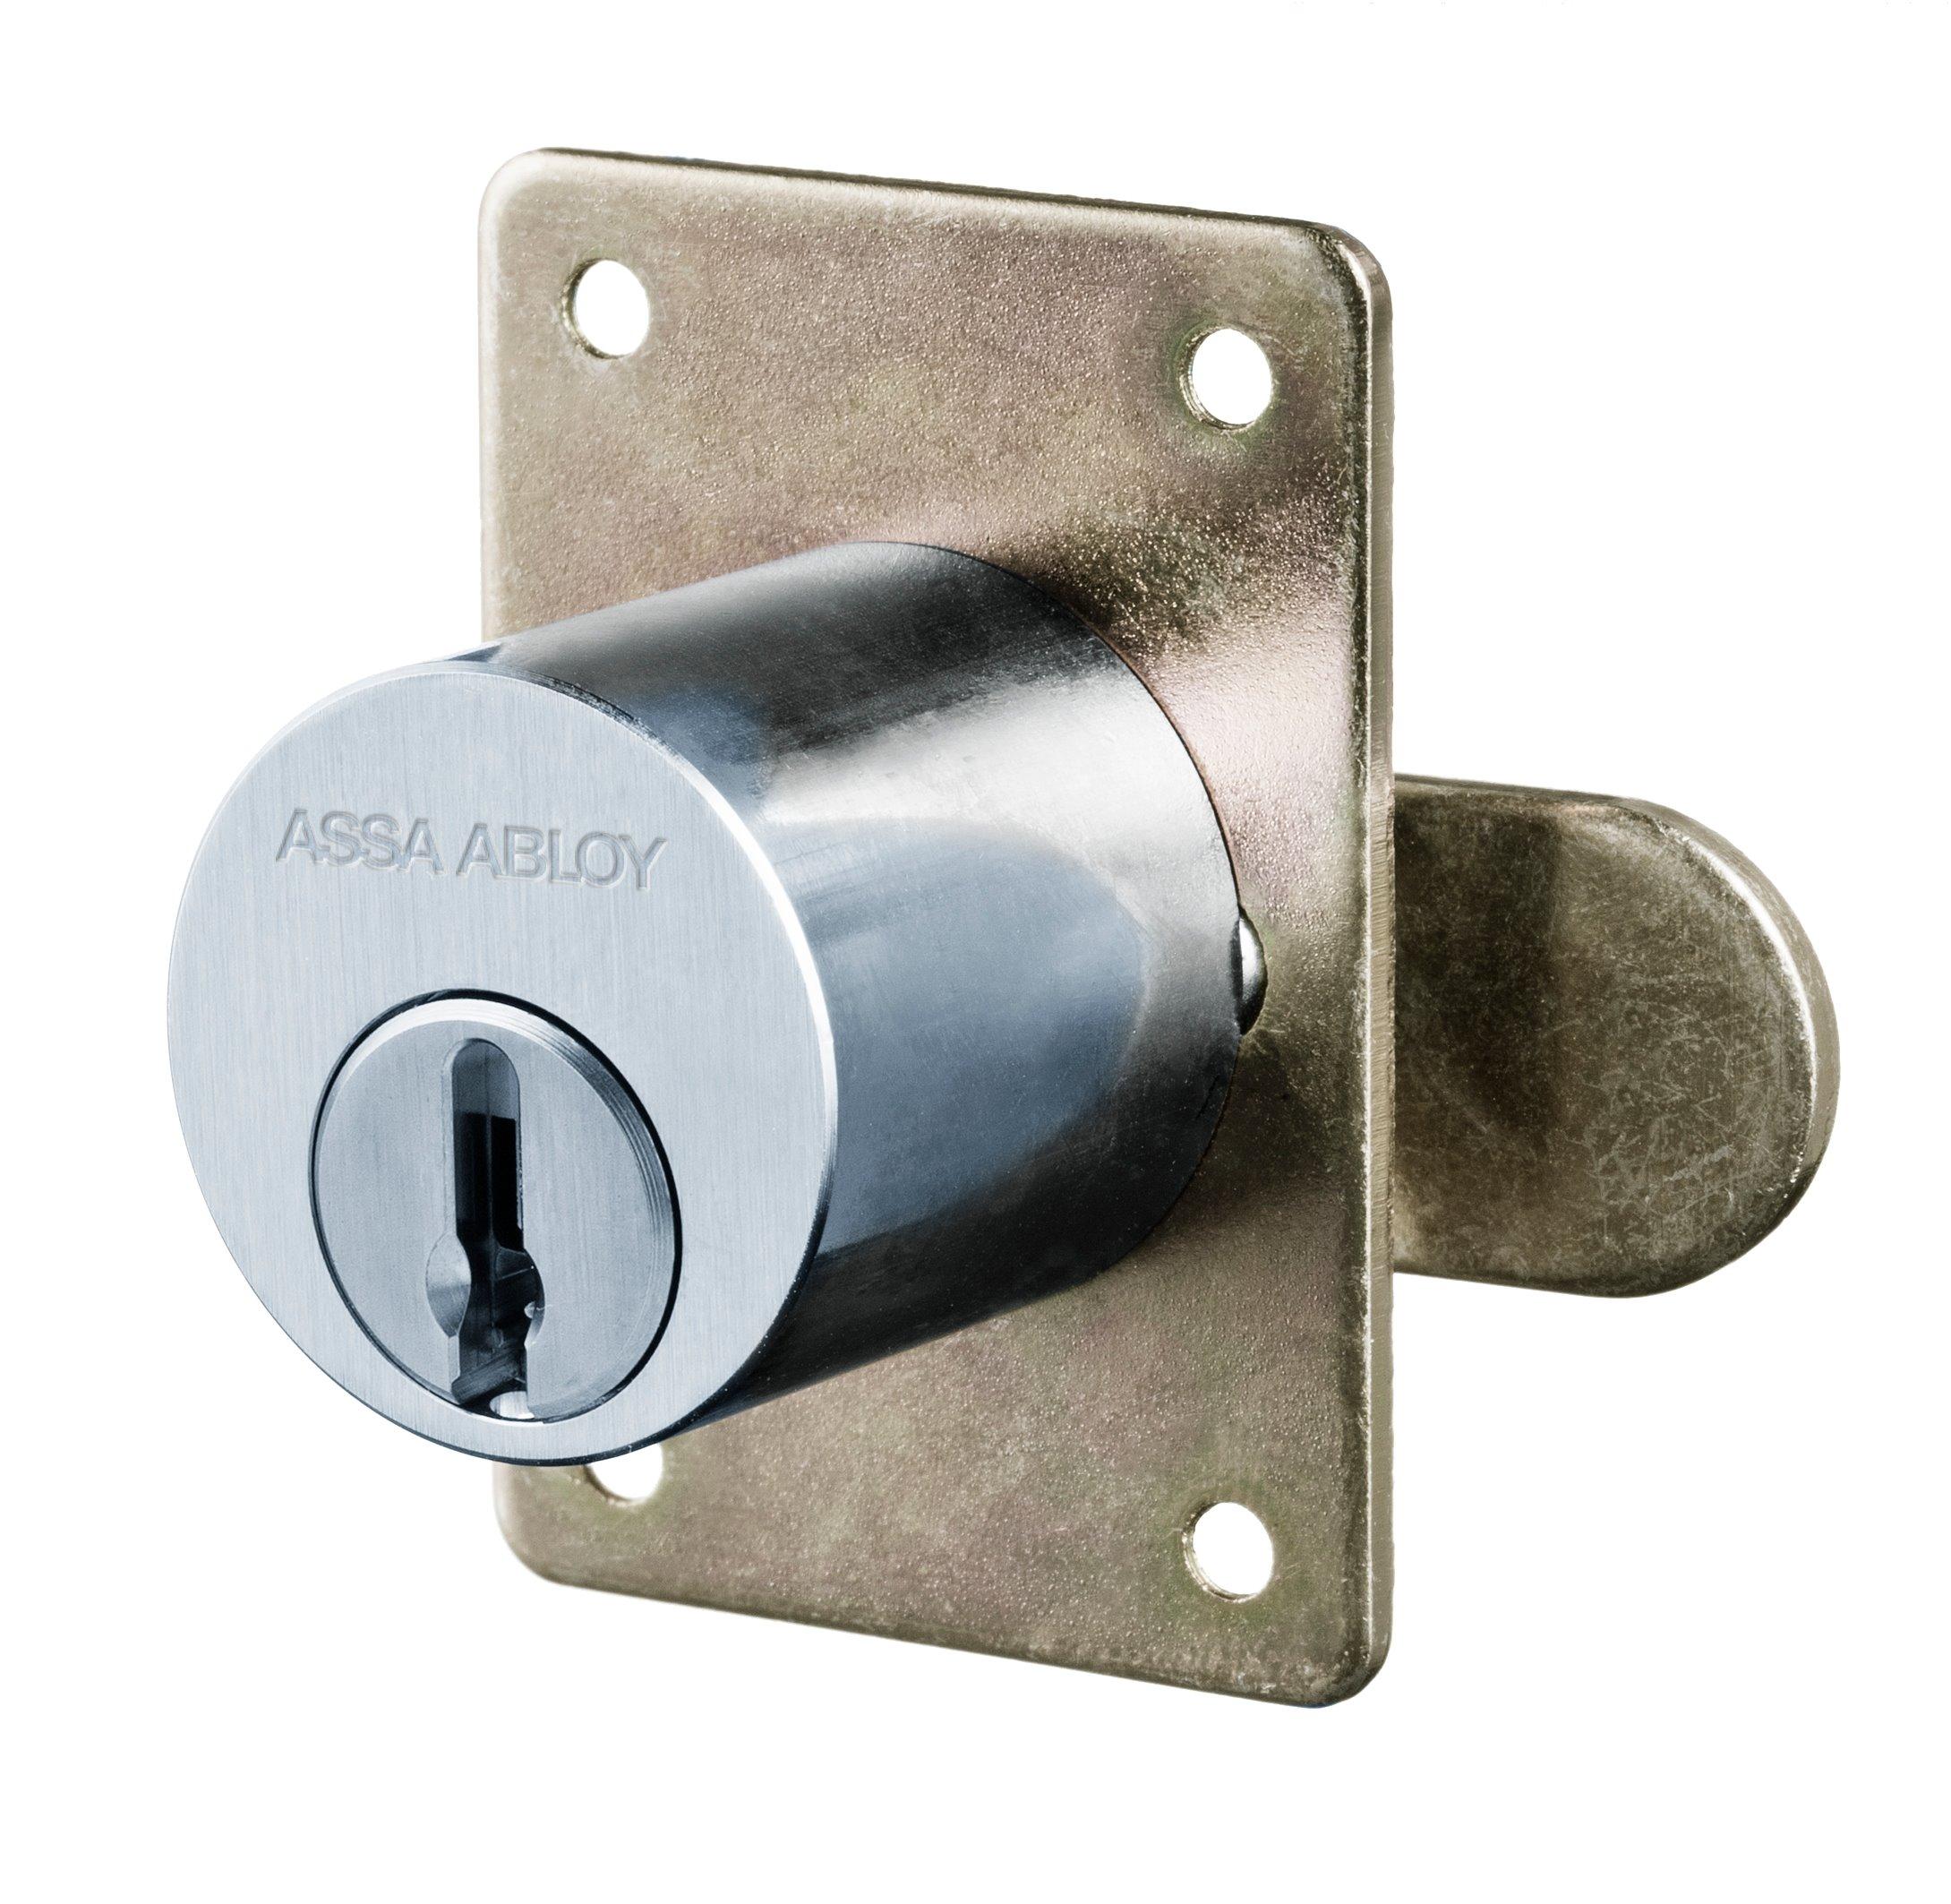 P672 - Furniture lock (1608)